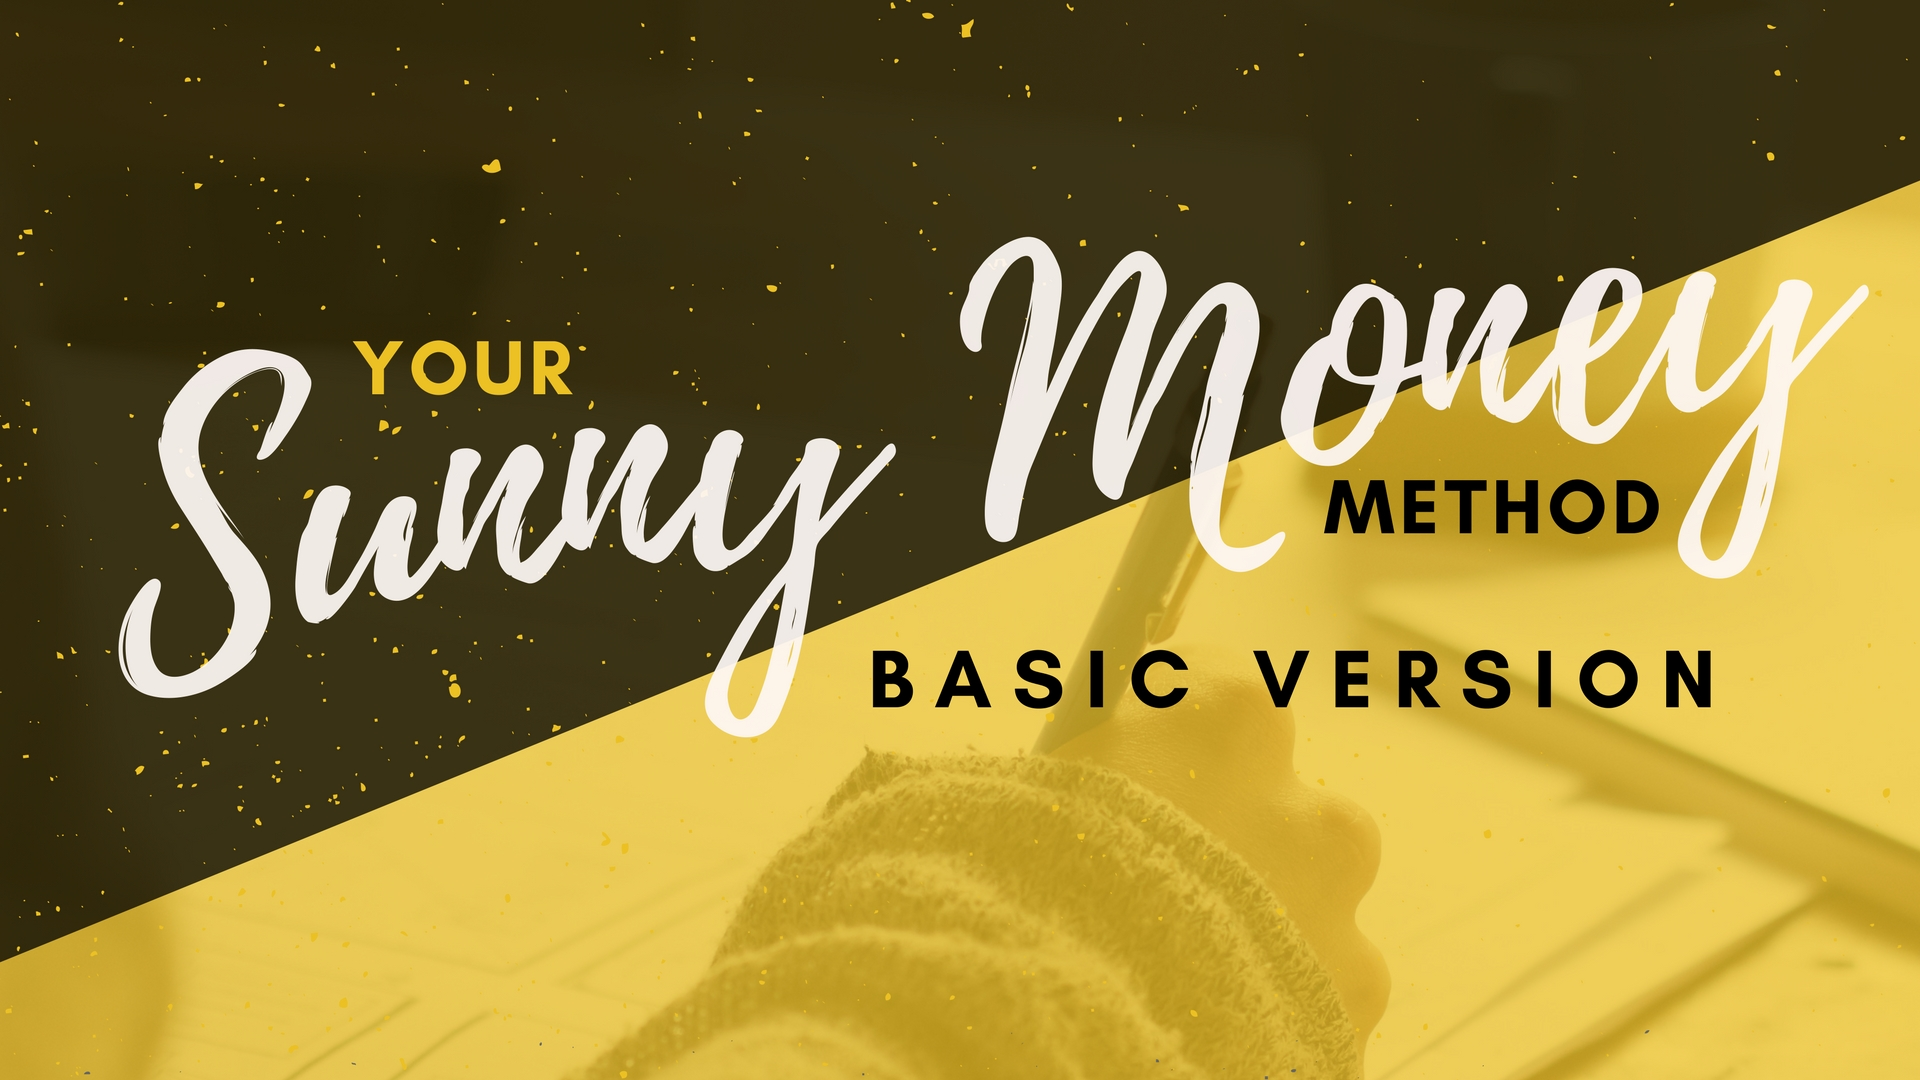 Your Sunny Money Method Basic Version Thumbnail.jpg